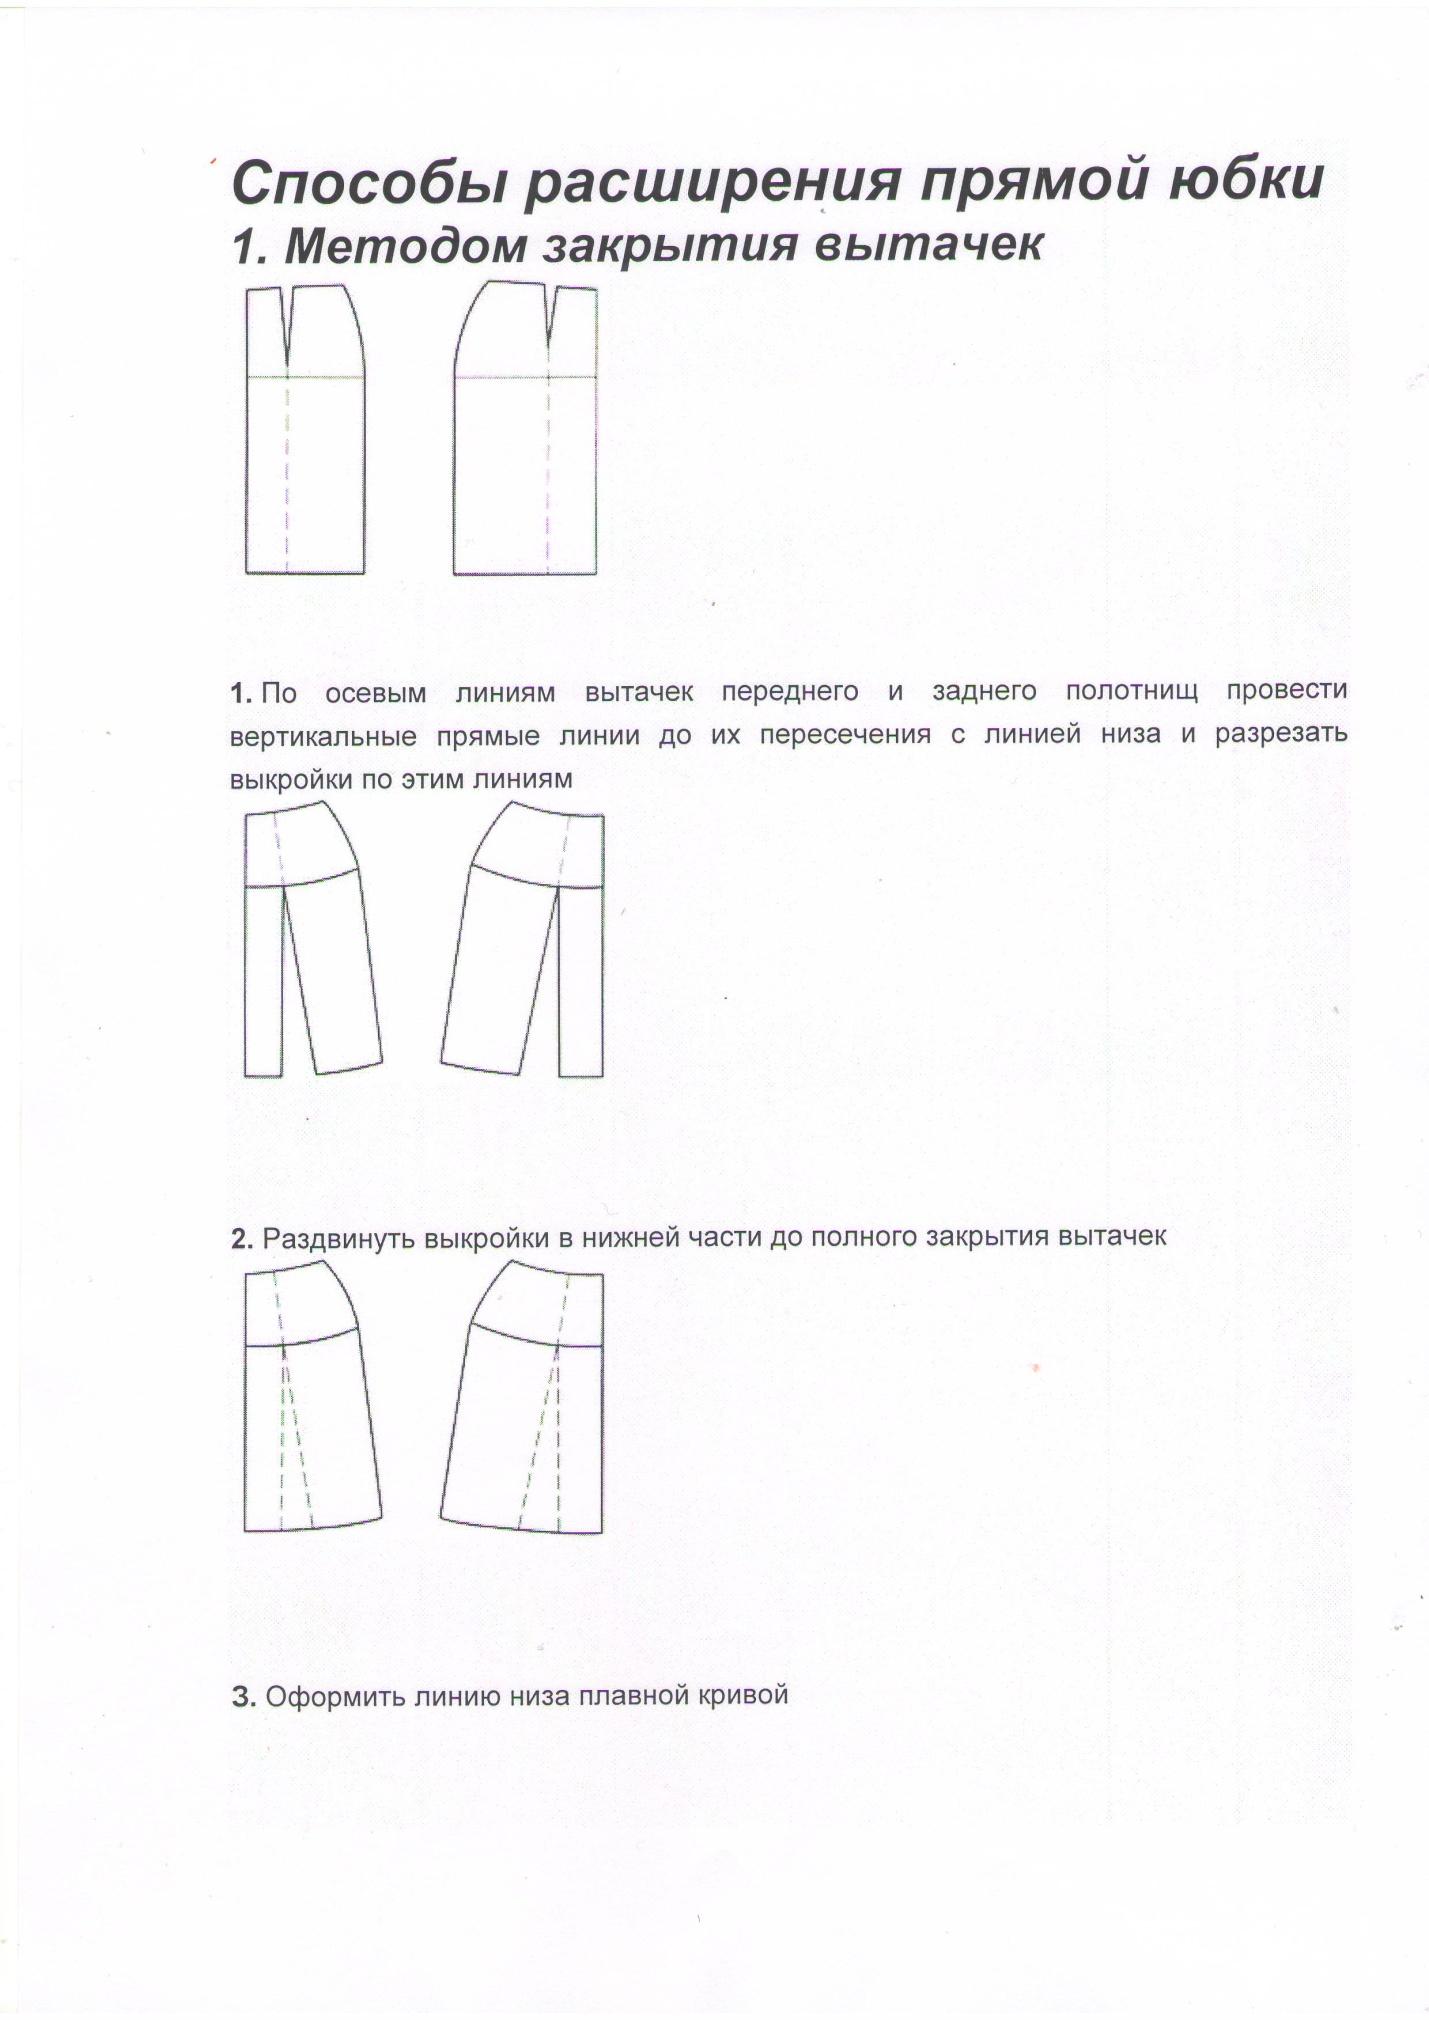 C:\Documents and Settings\User\Мои документы\Мои рисунки\2015-12-20\Изображение0007.JPG